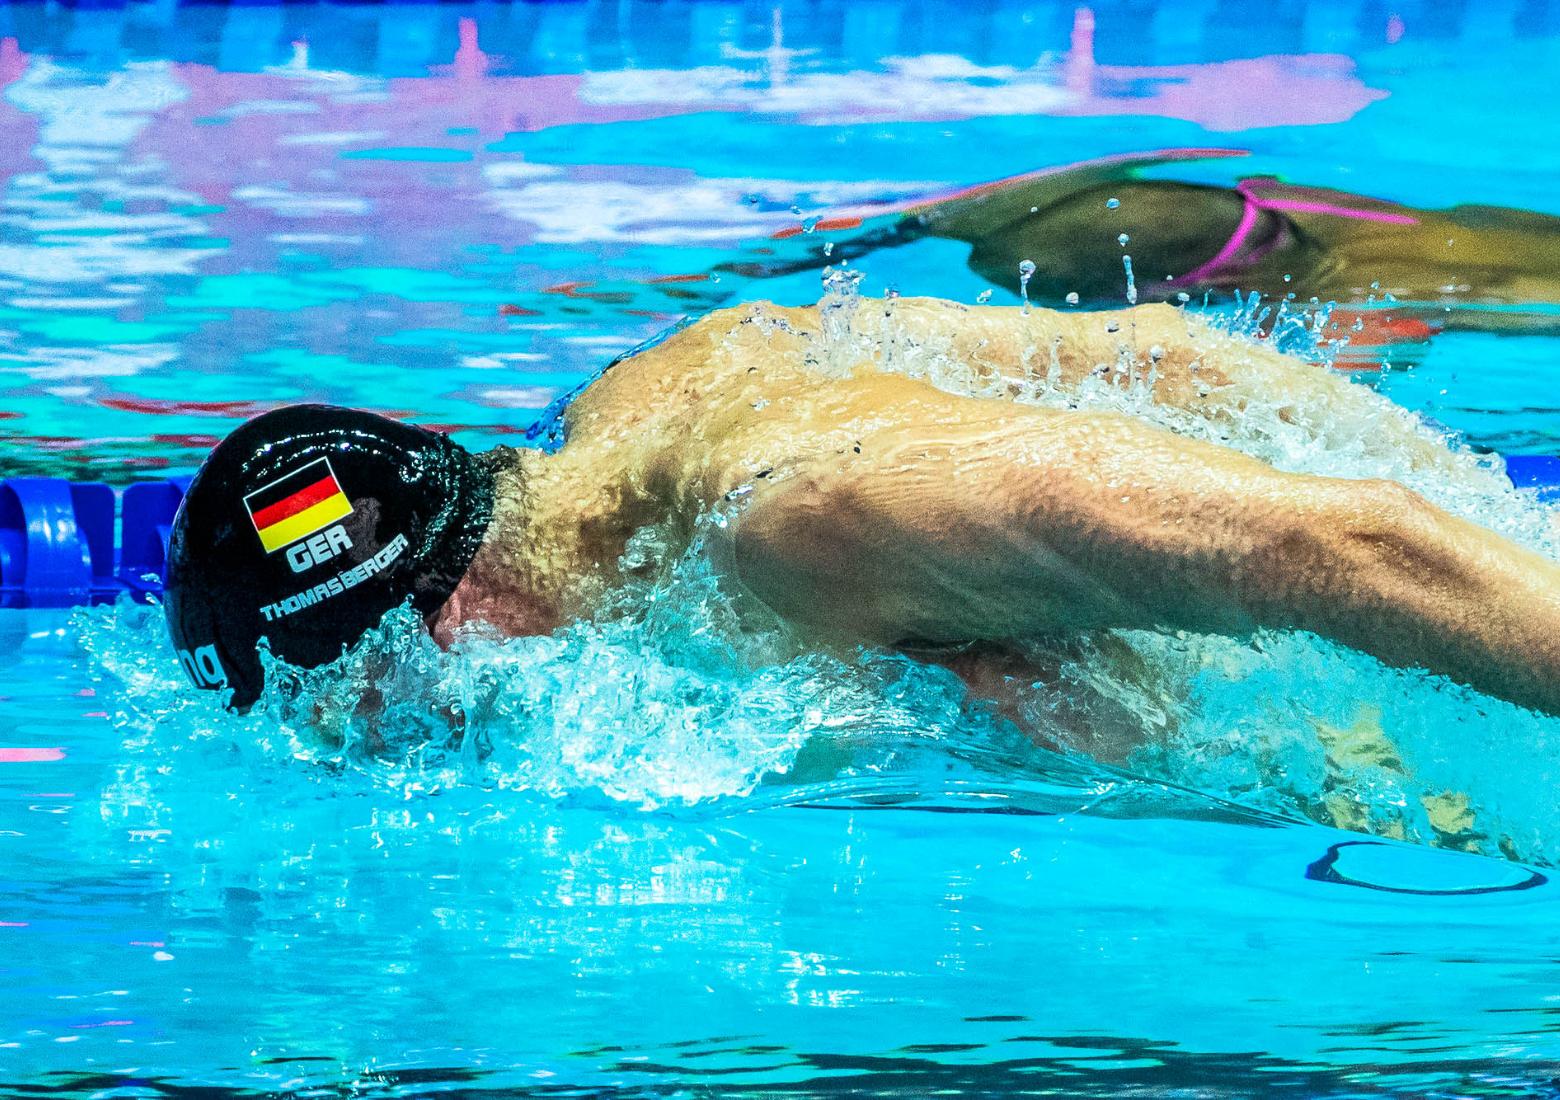 David Thomasberger eröffnet Olympiaquali mit Rekord